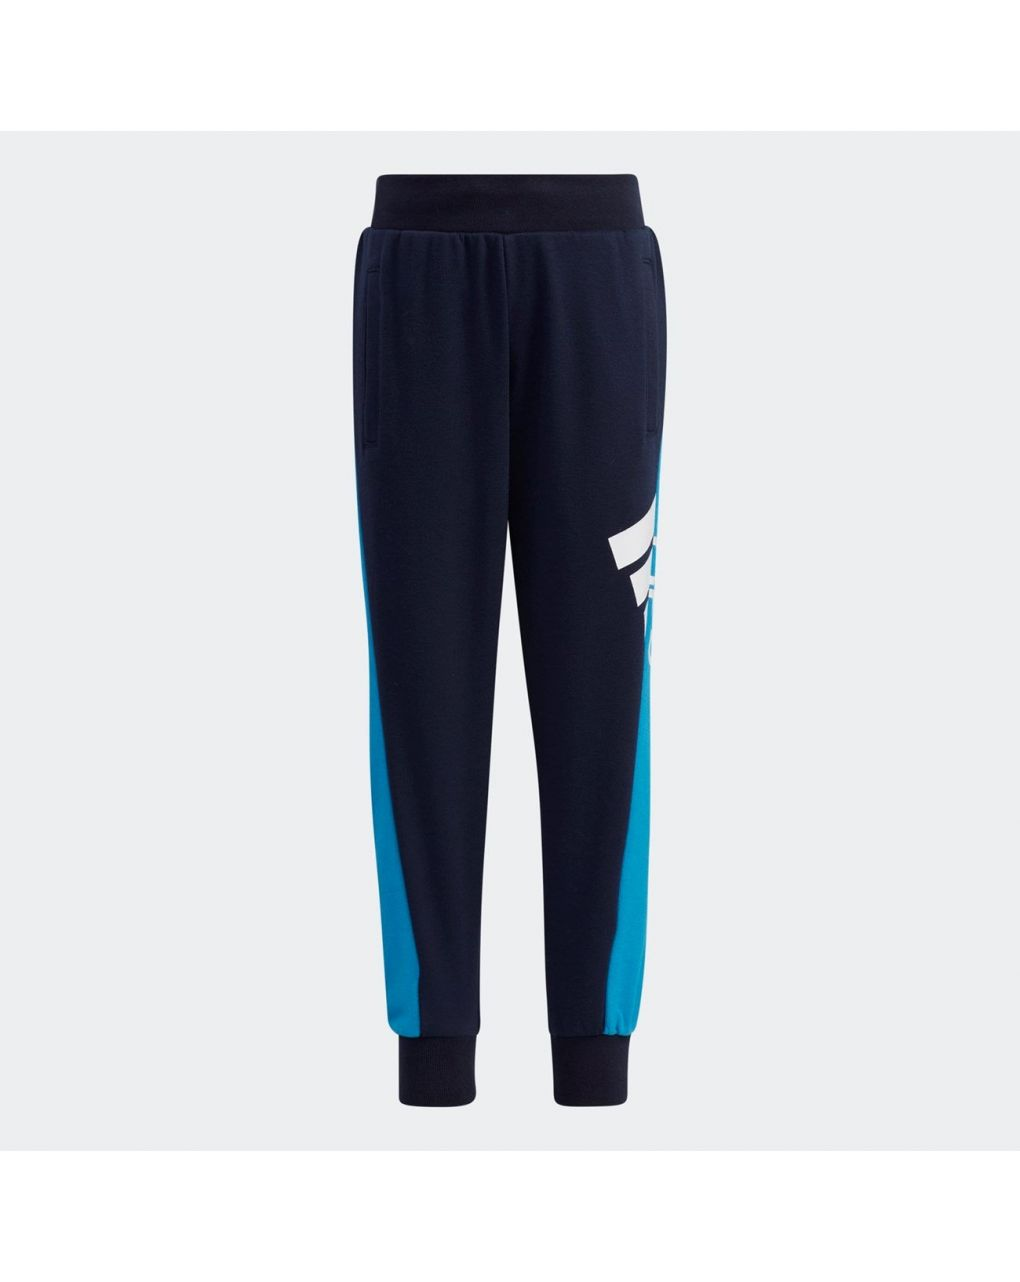 Adidas Παντελόνι Φόρμας Aeroready Badge of Sport Μπλε για Αγόρι H40260